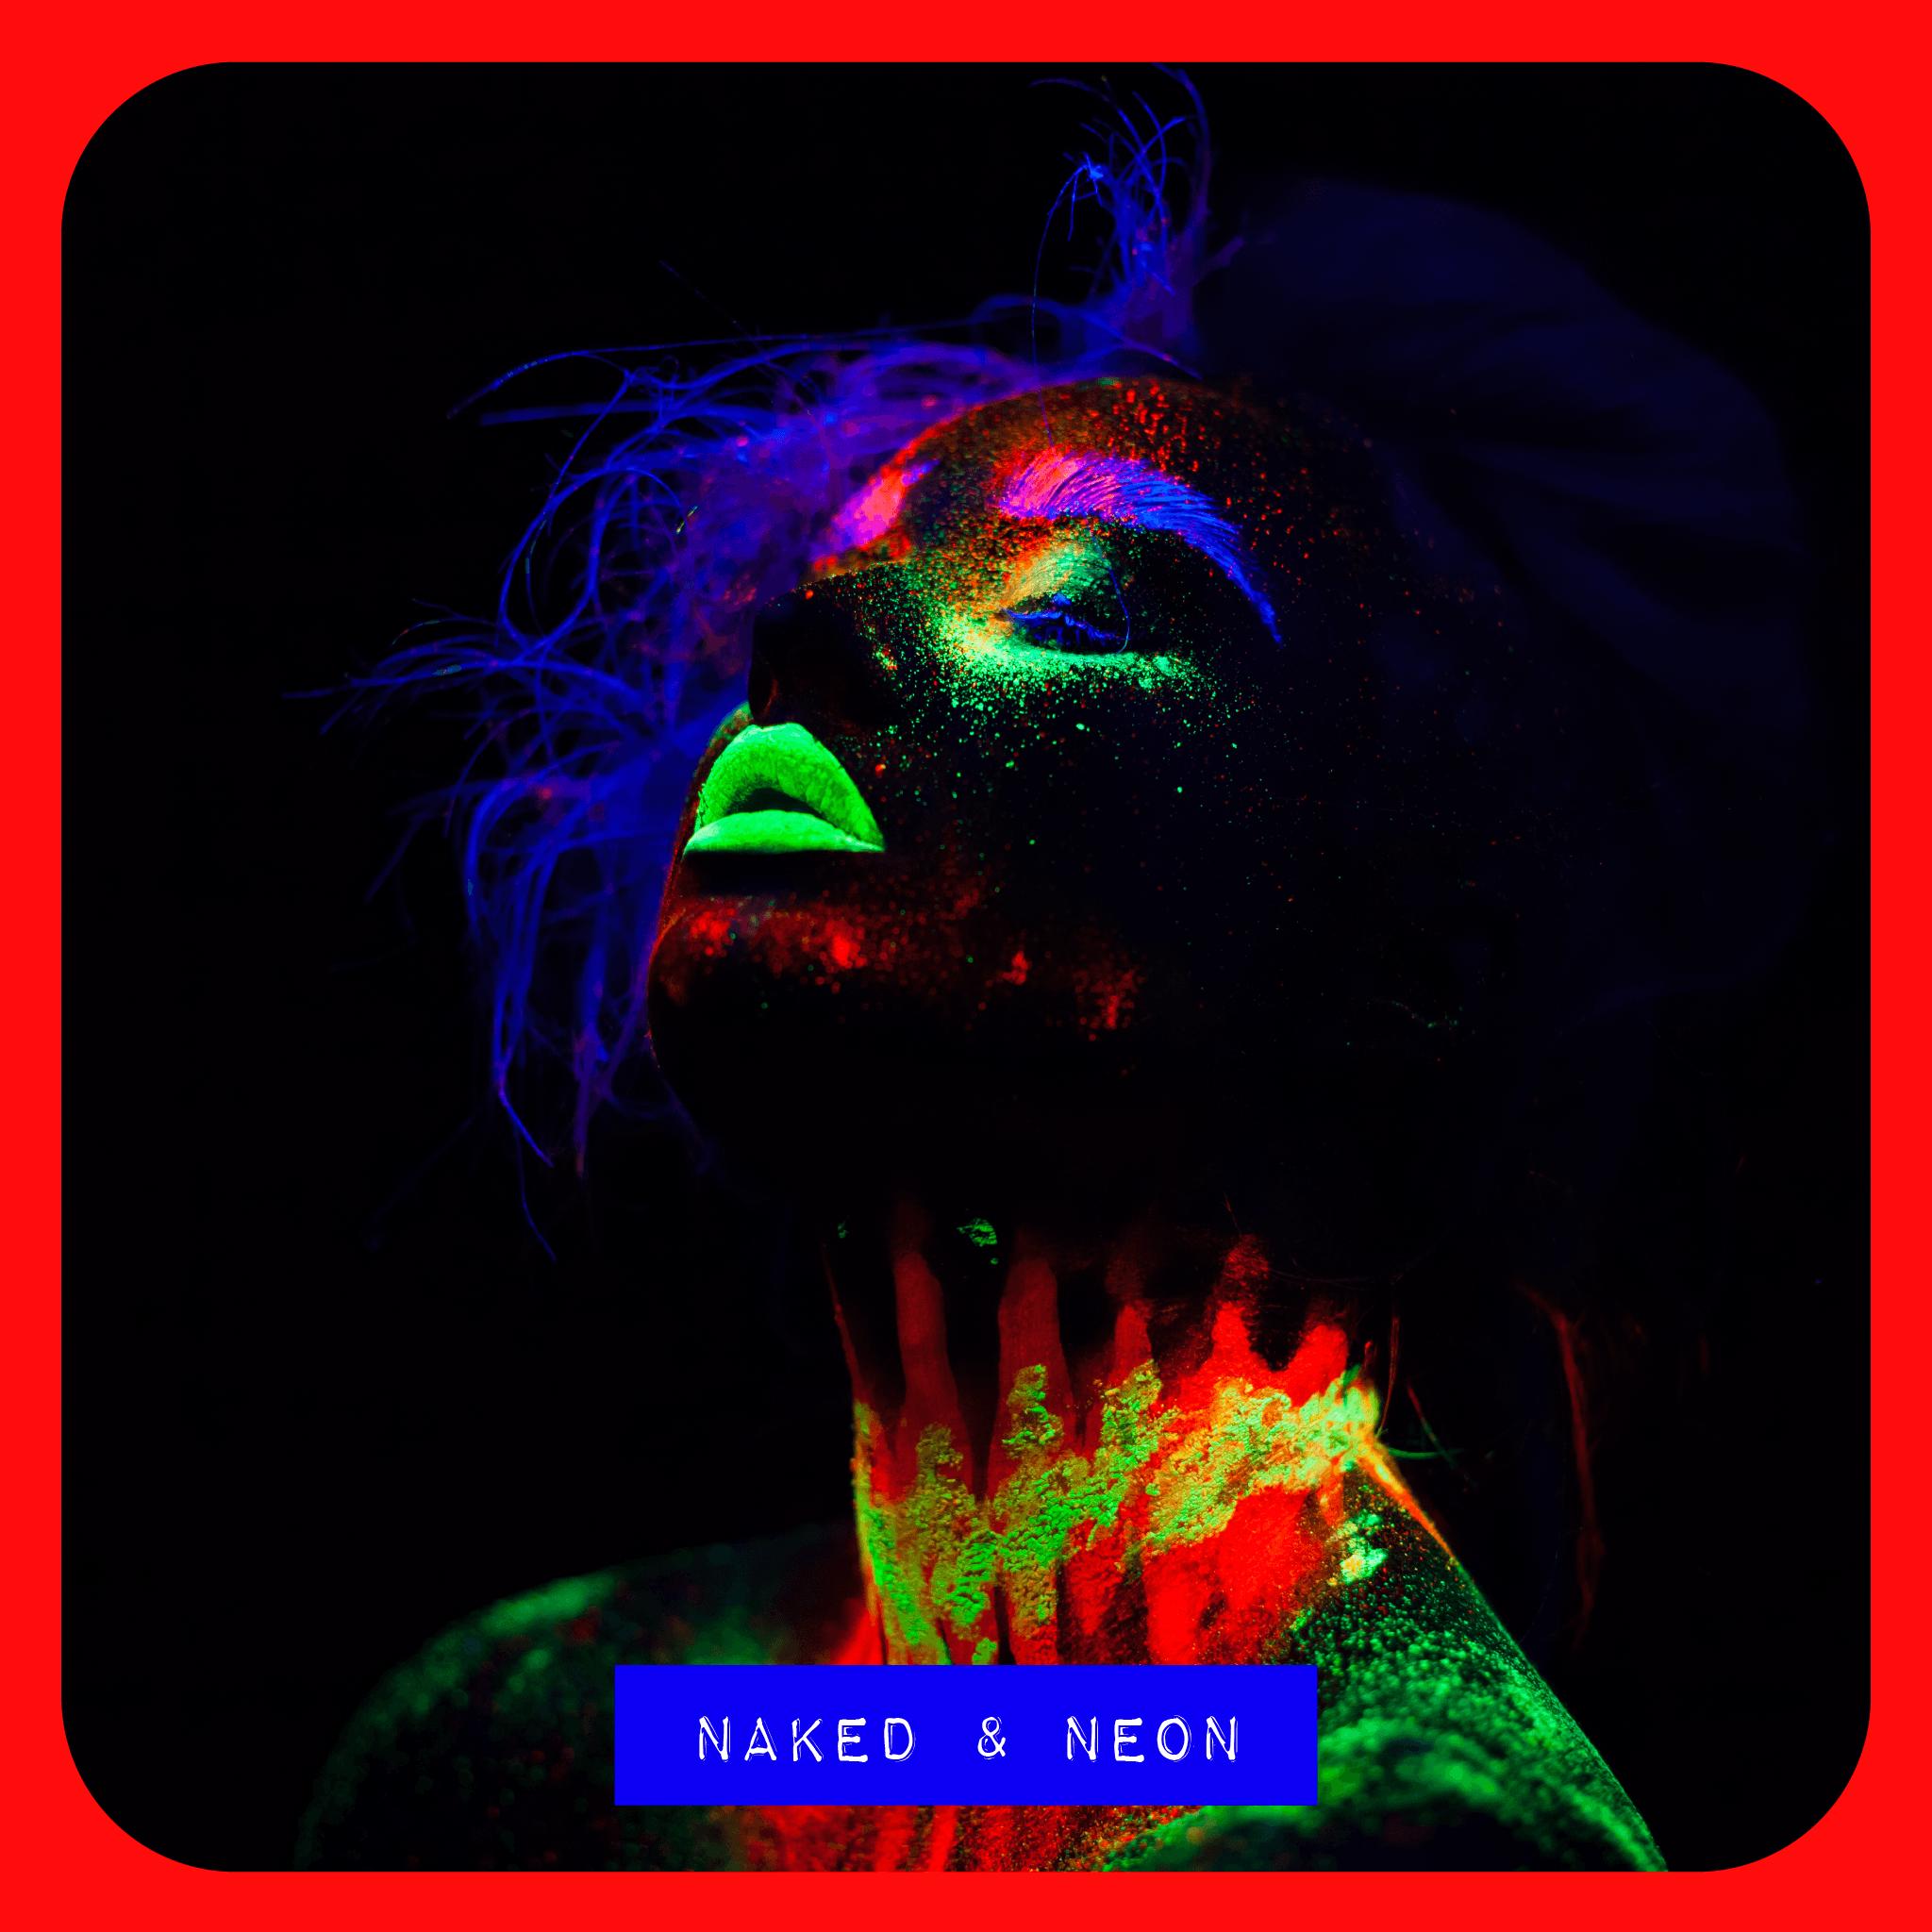 neon-image